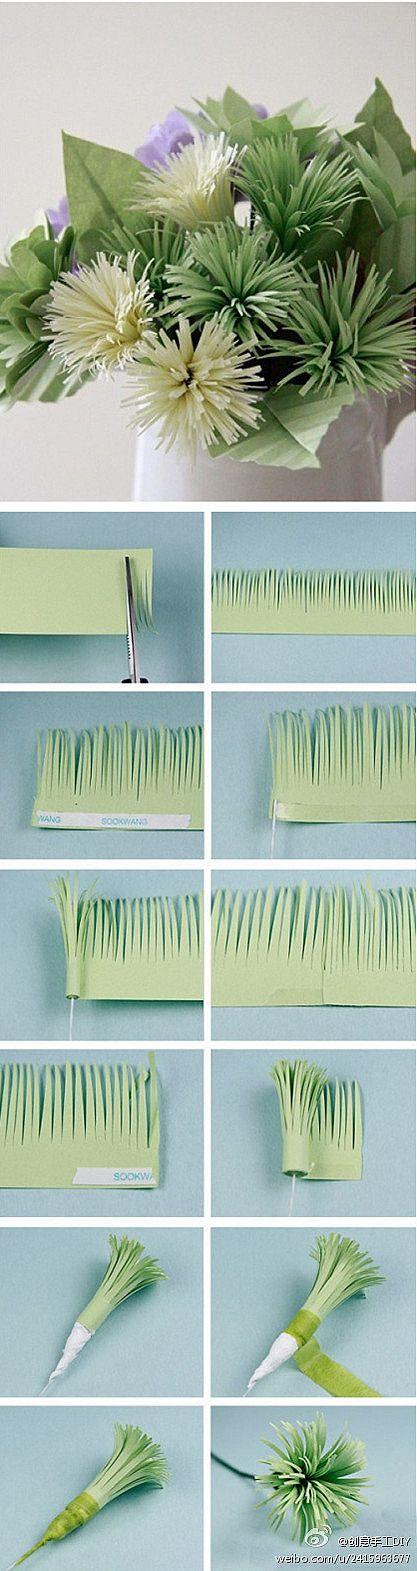 Fringe-scissors to make a pretty paper flower {Tutorial}